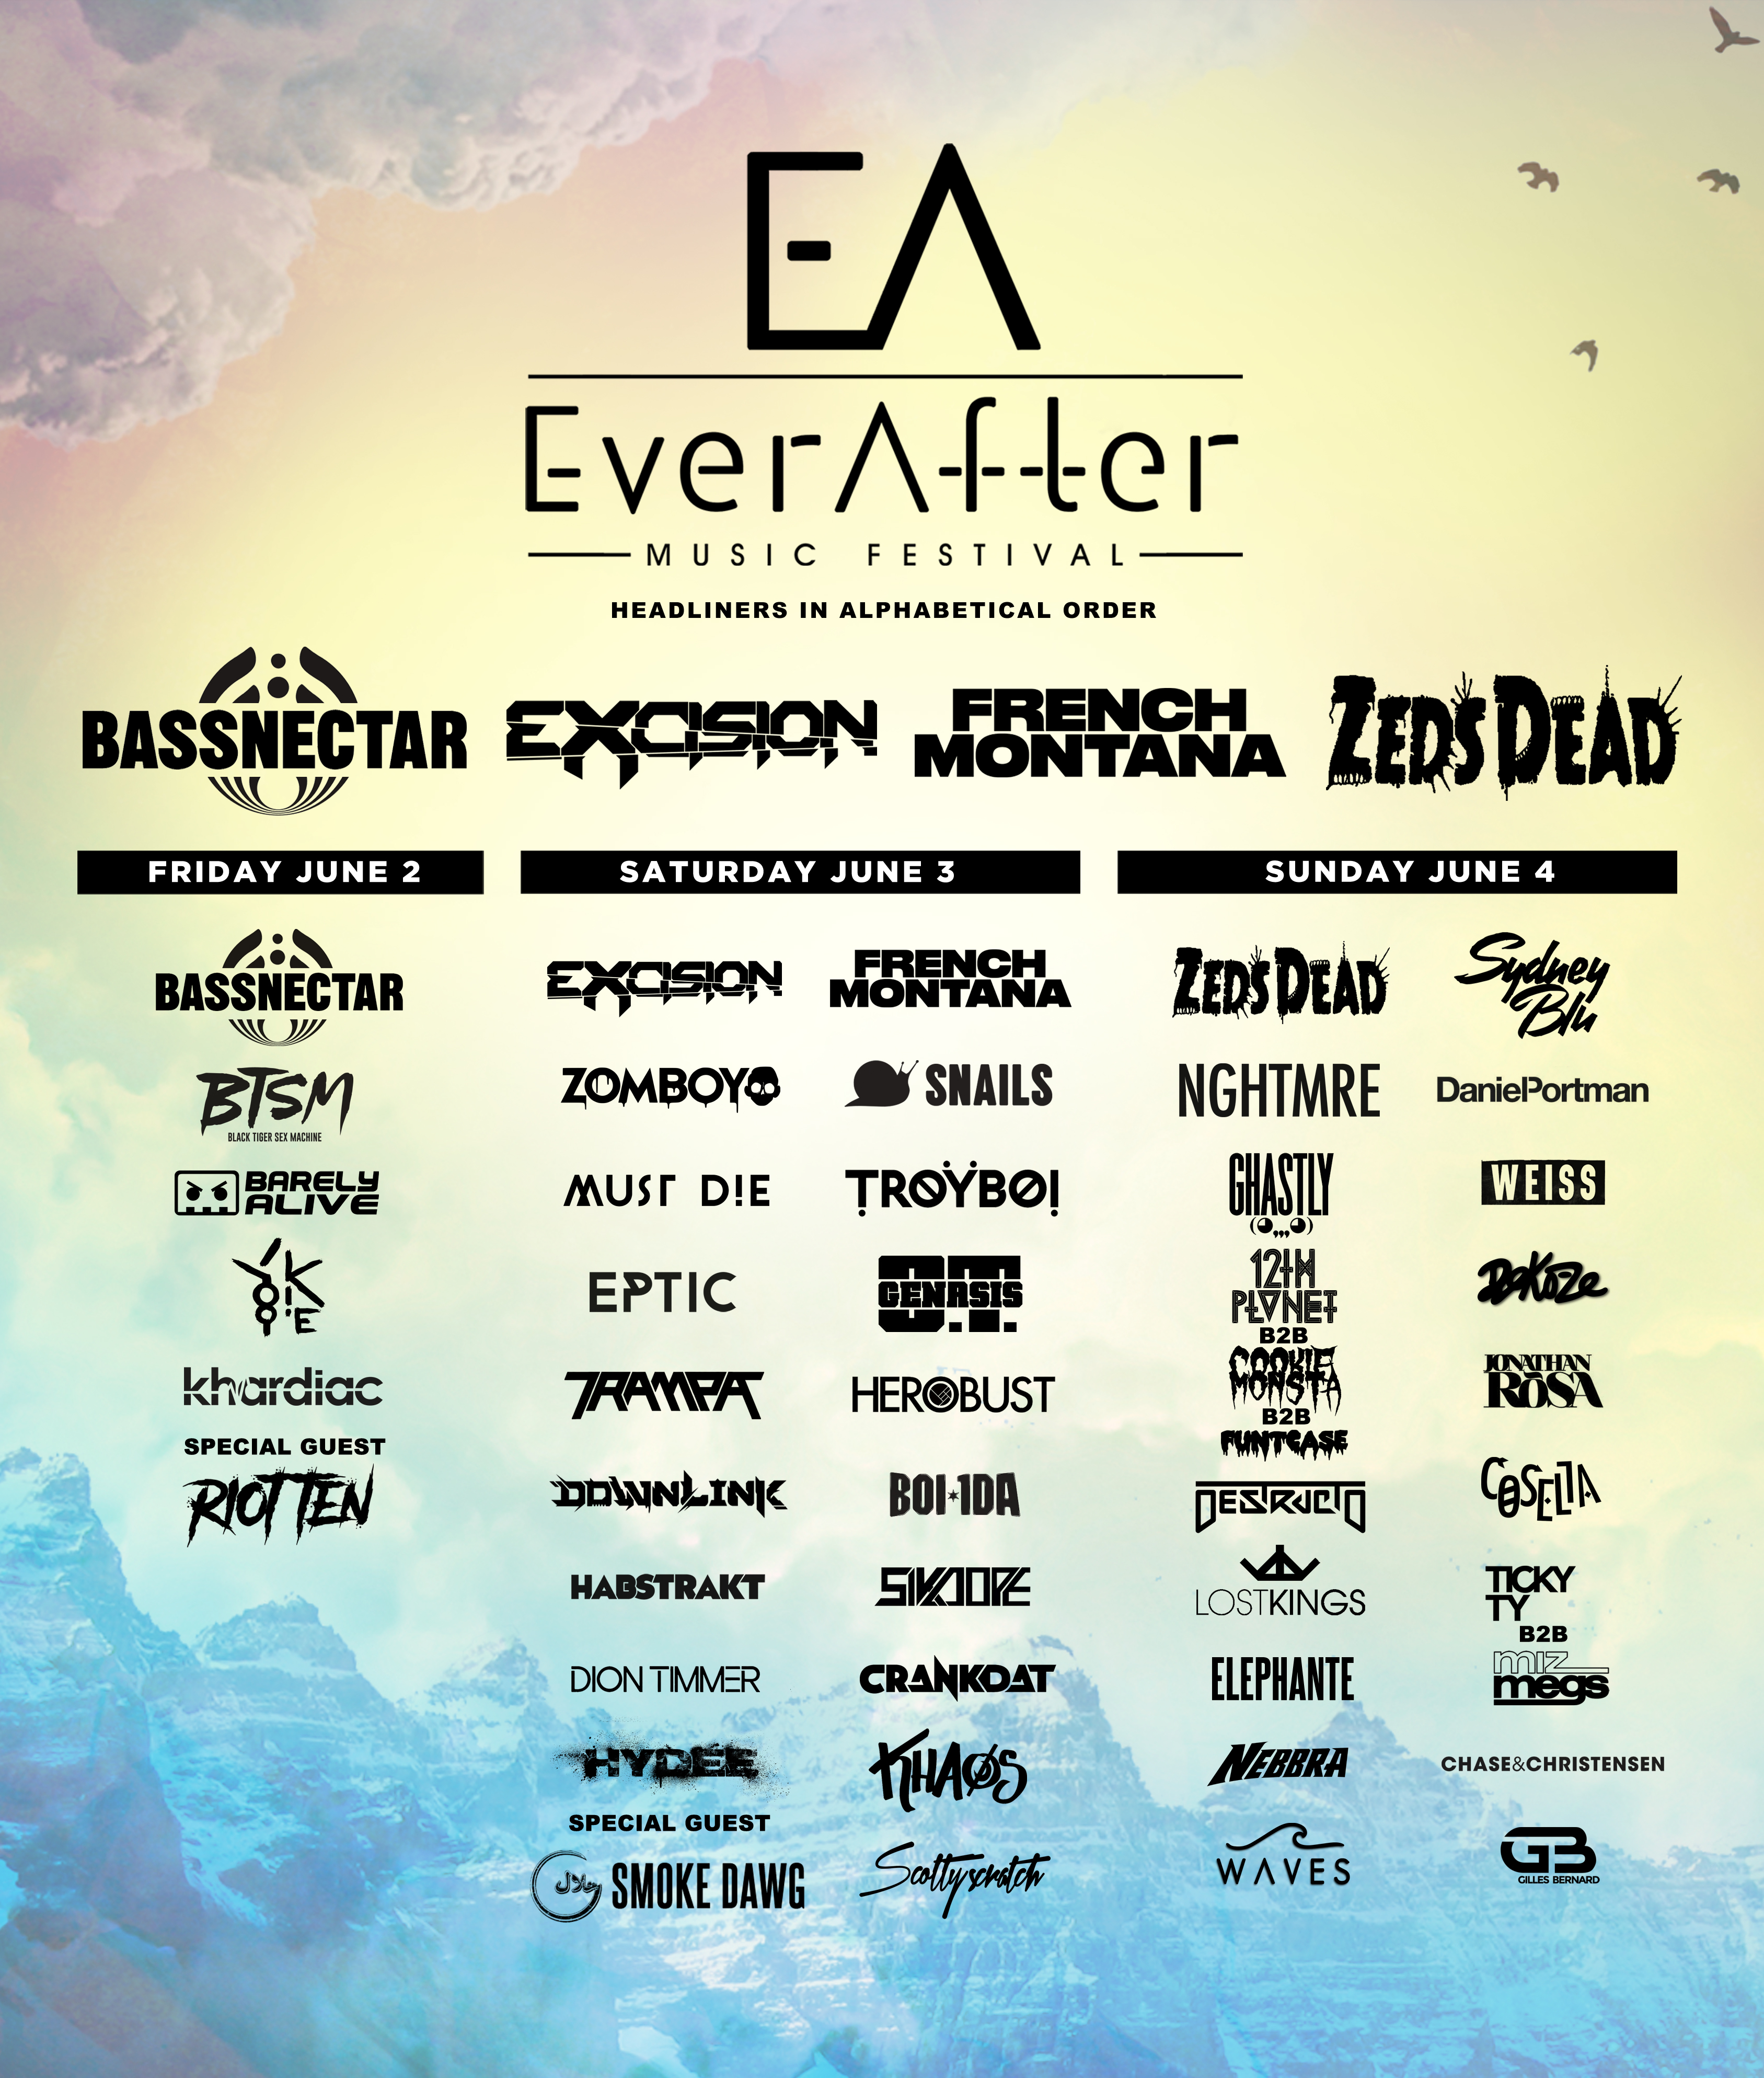 Bassnectar at Ever After 2017